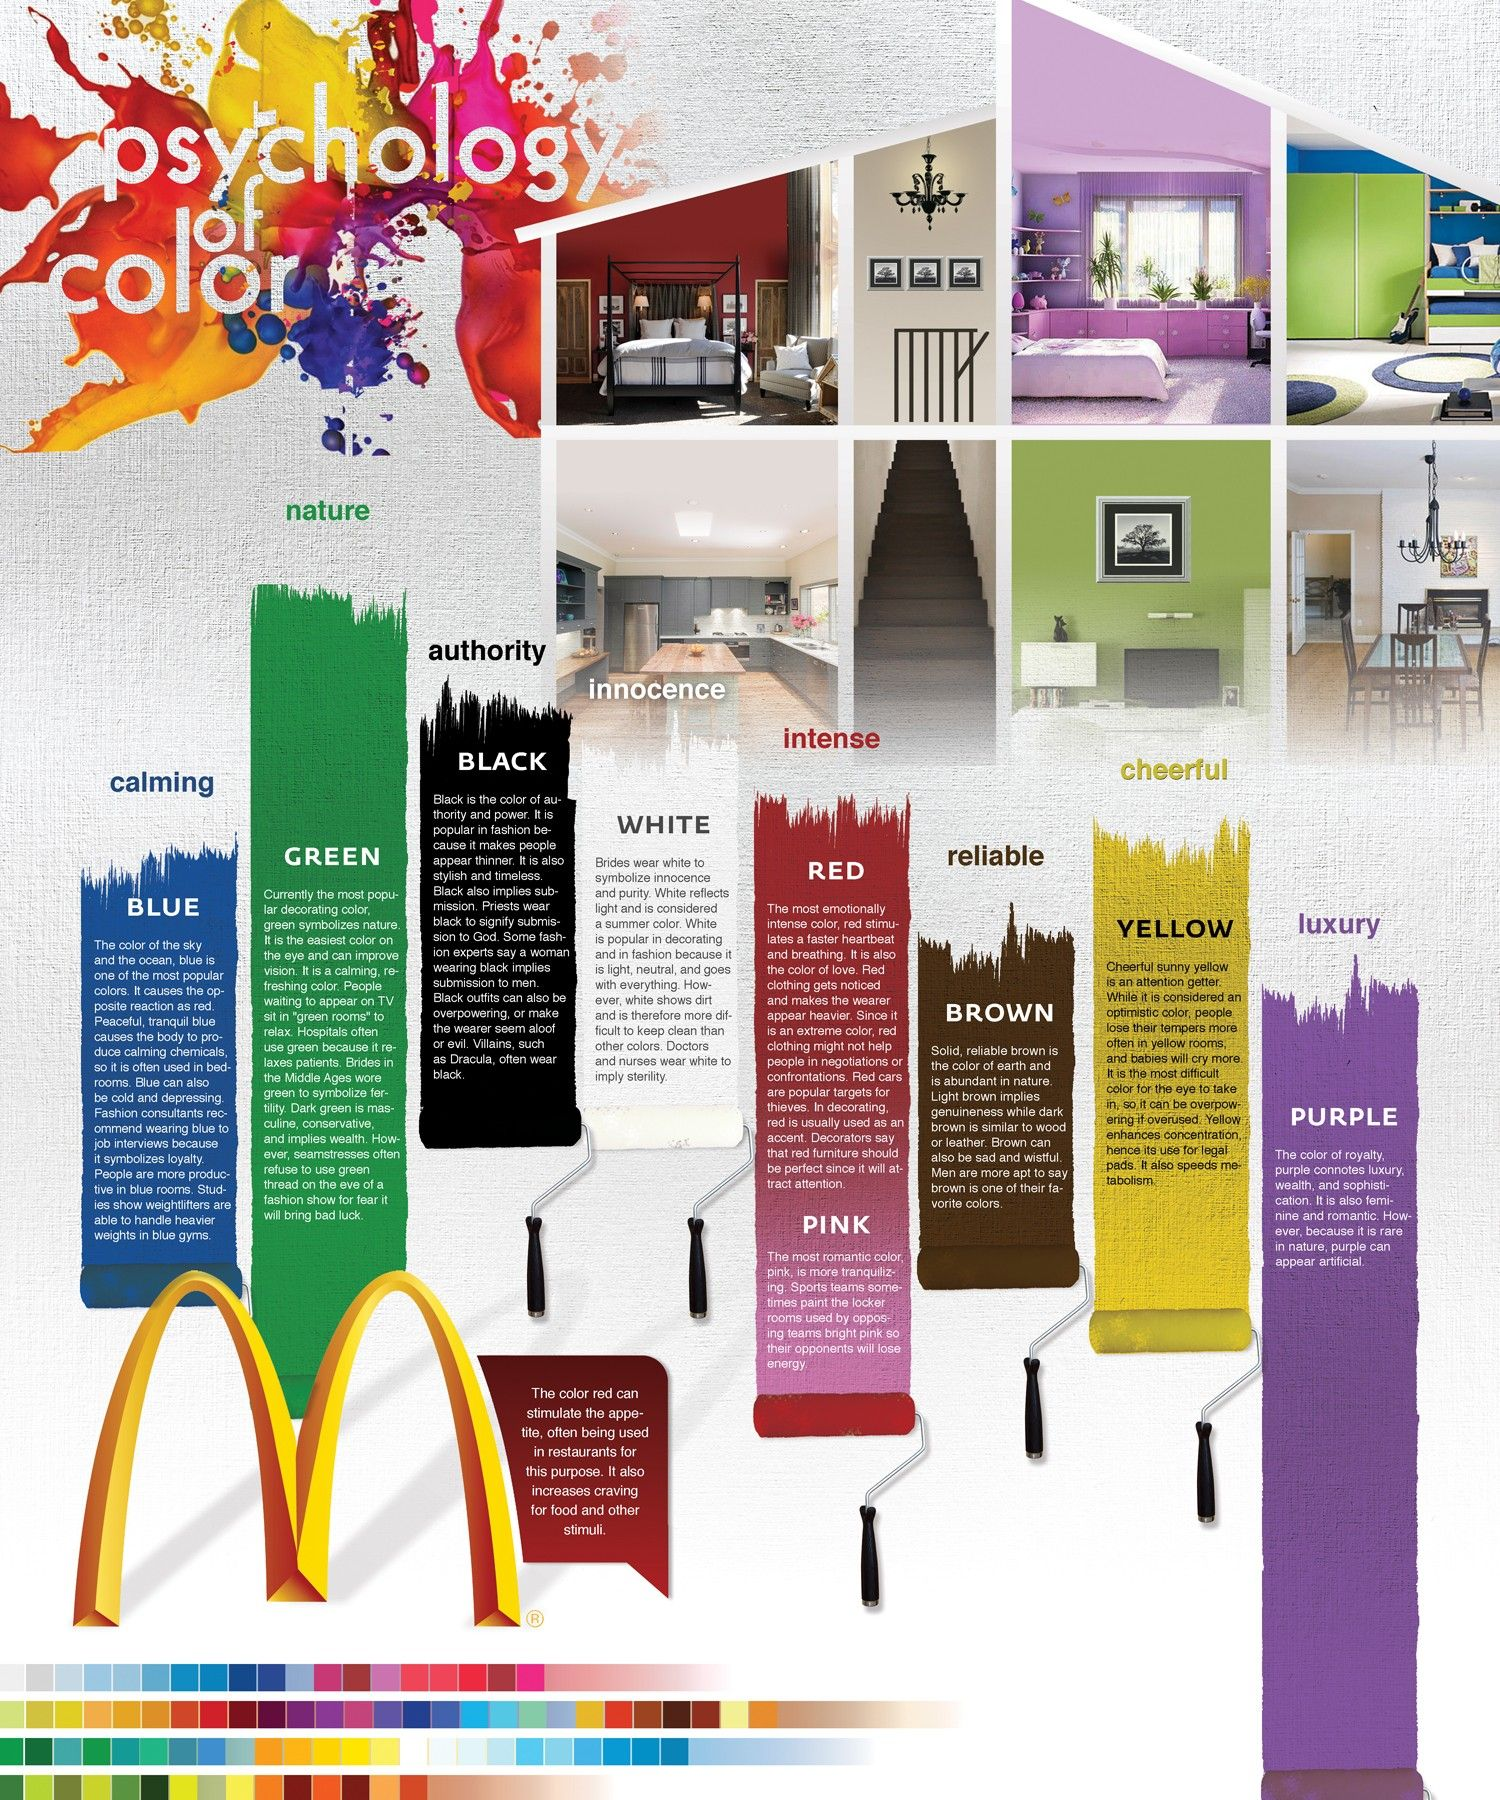 Colors web design psychology - Psychology Of Color